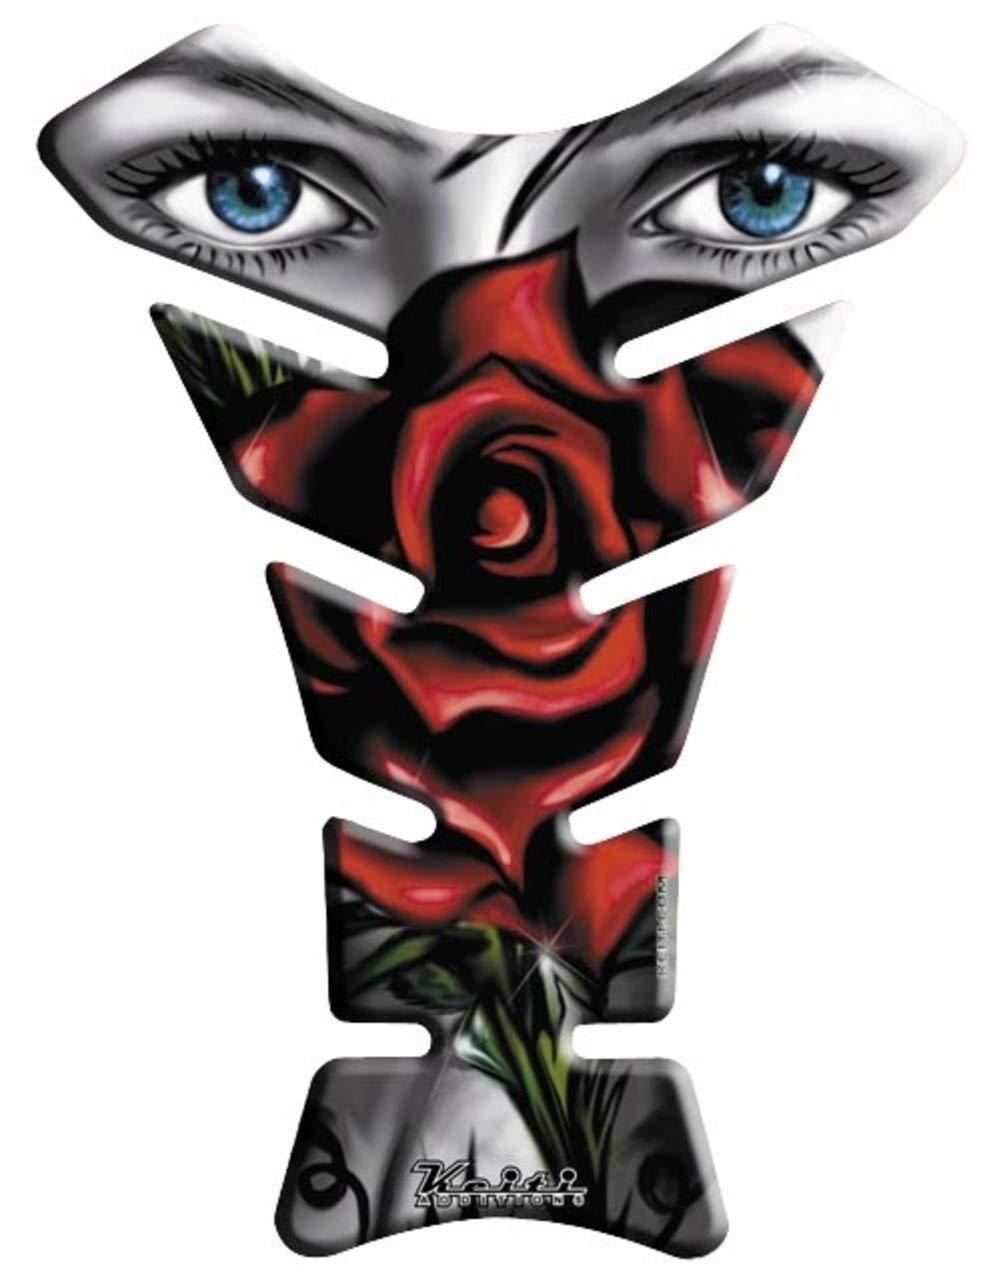 KEITI Protà ¨ ge Rà © servoir Moto Tank Pad Sticker Autocollant KT8140 Lady & Rose